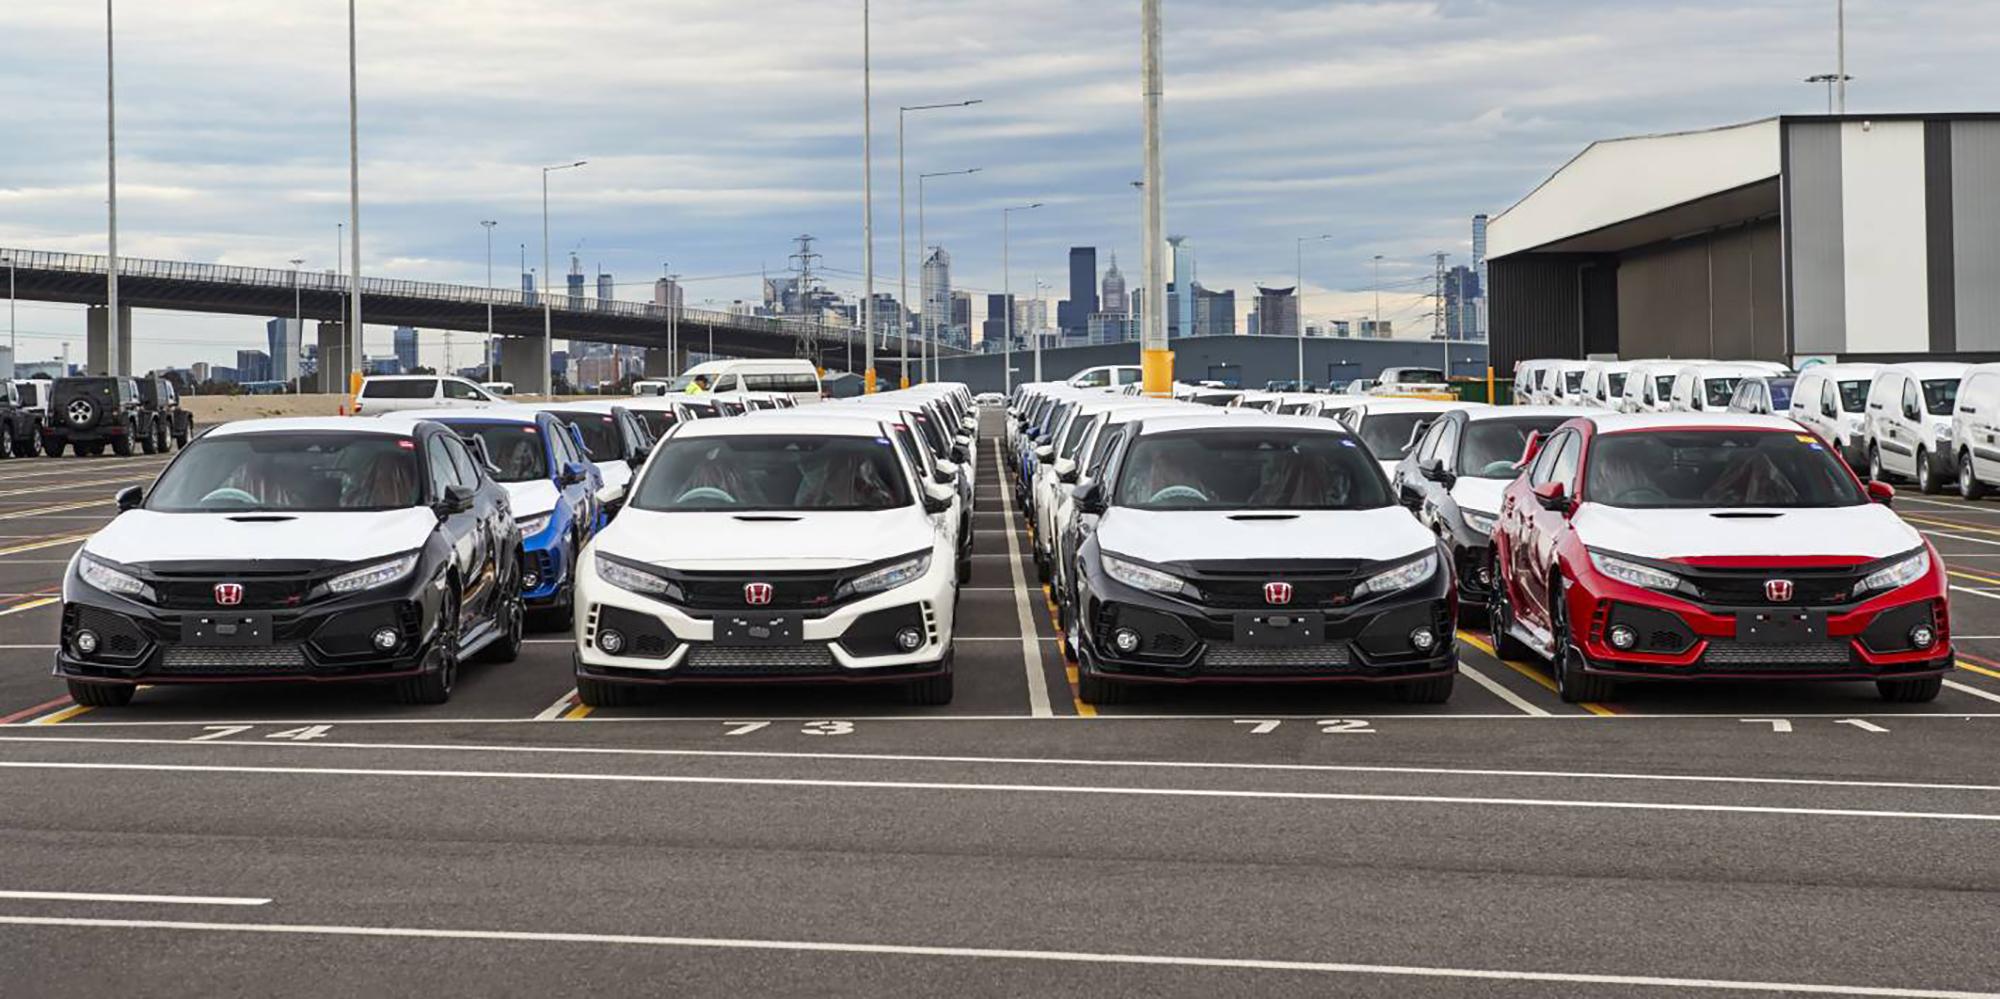 2018 Honda Civic Type R docks in Australia - photos | CarAdvice